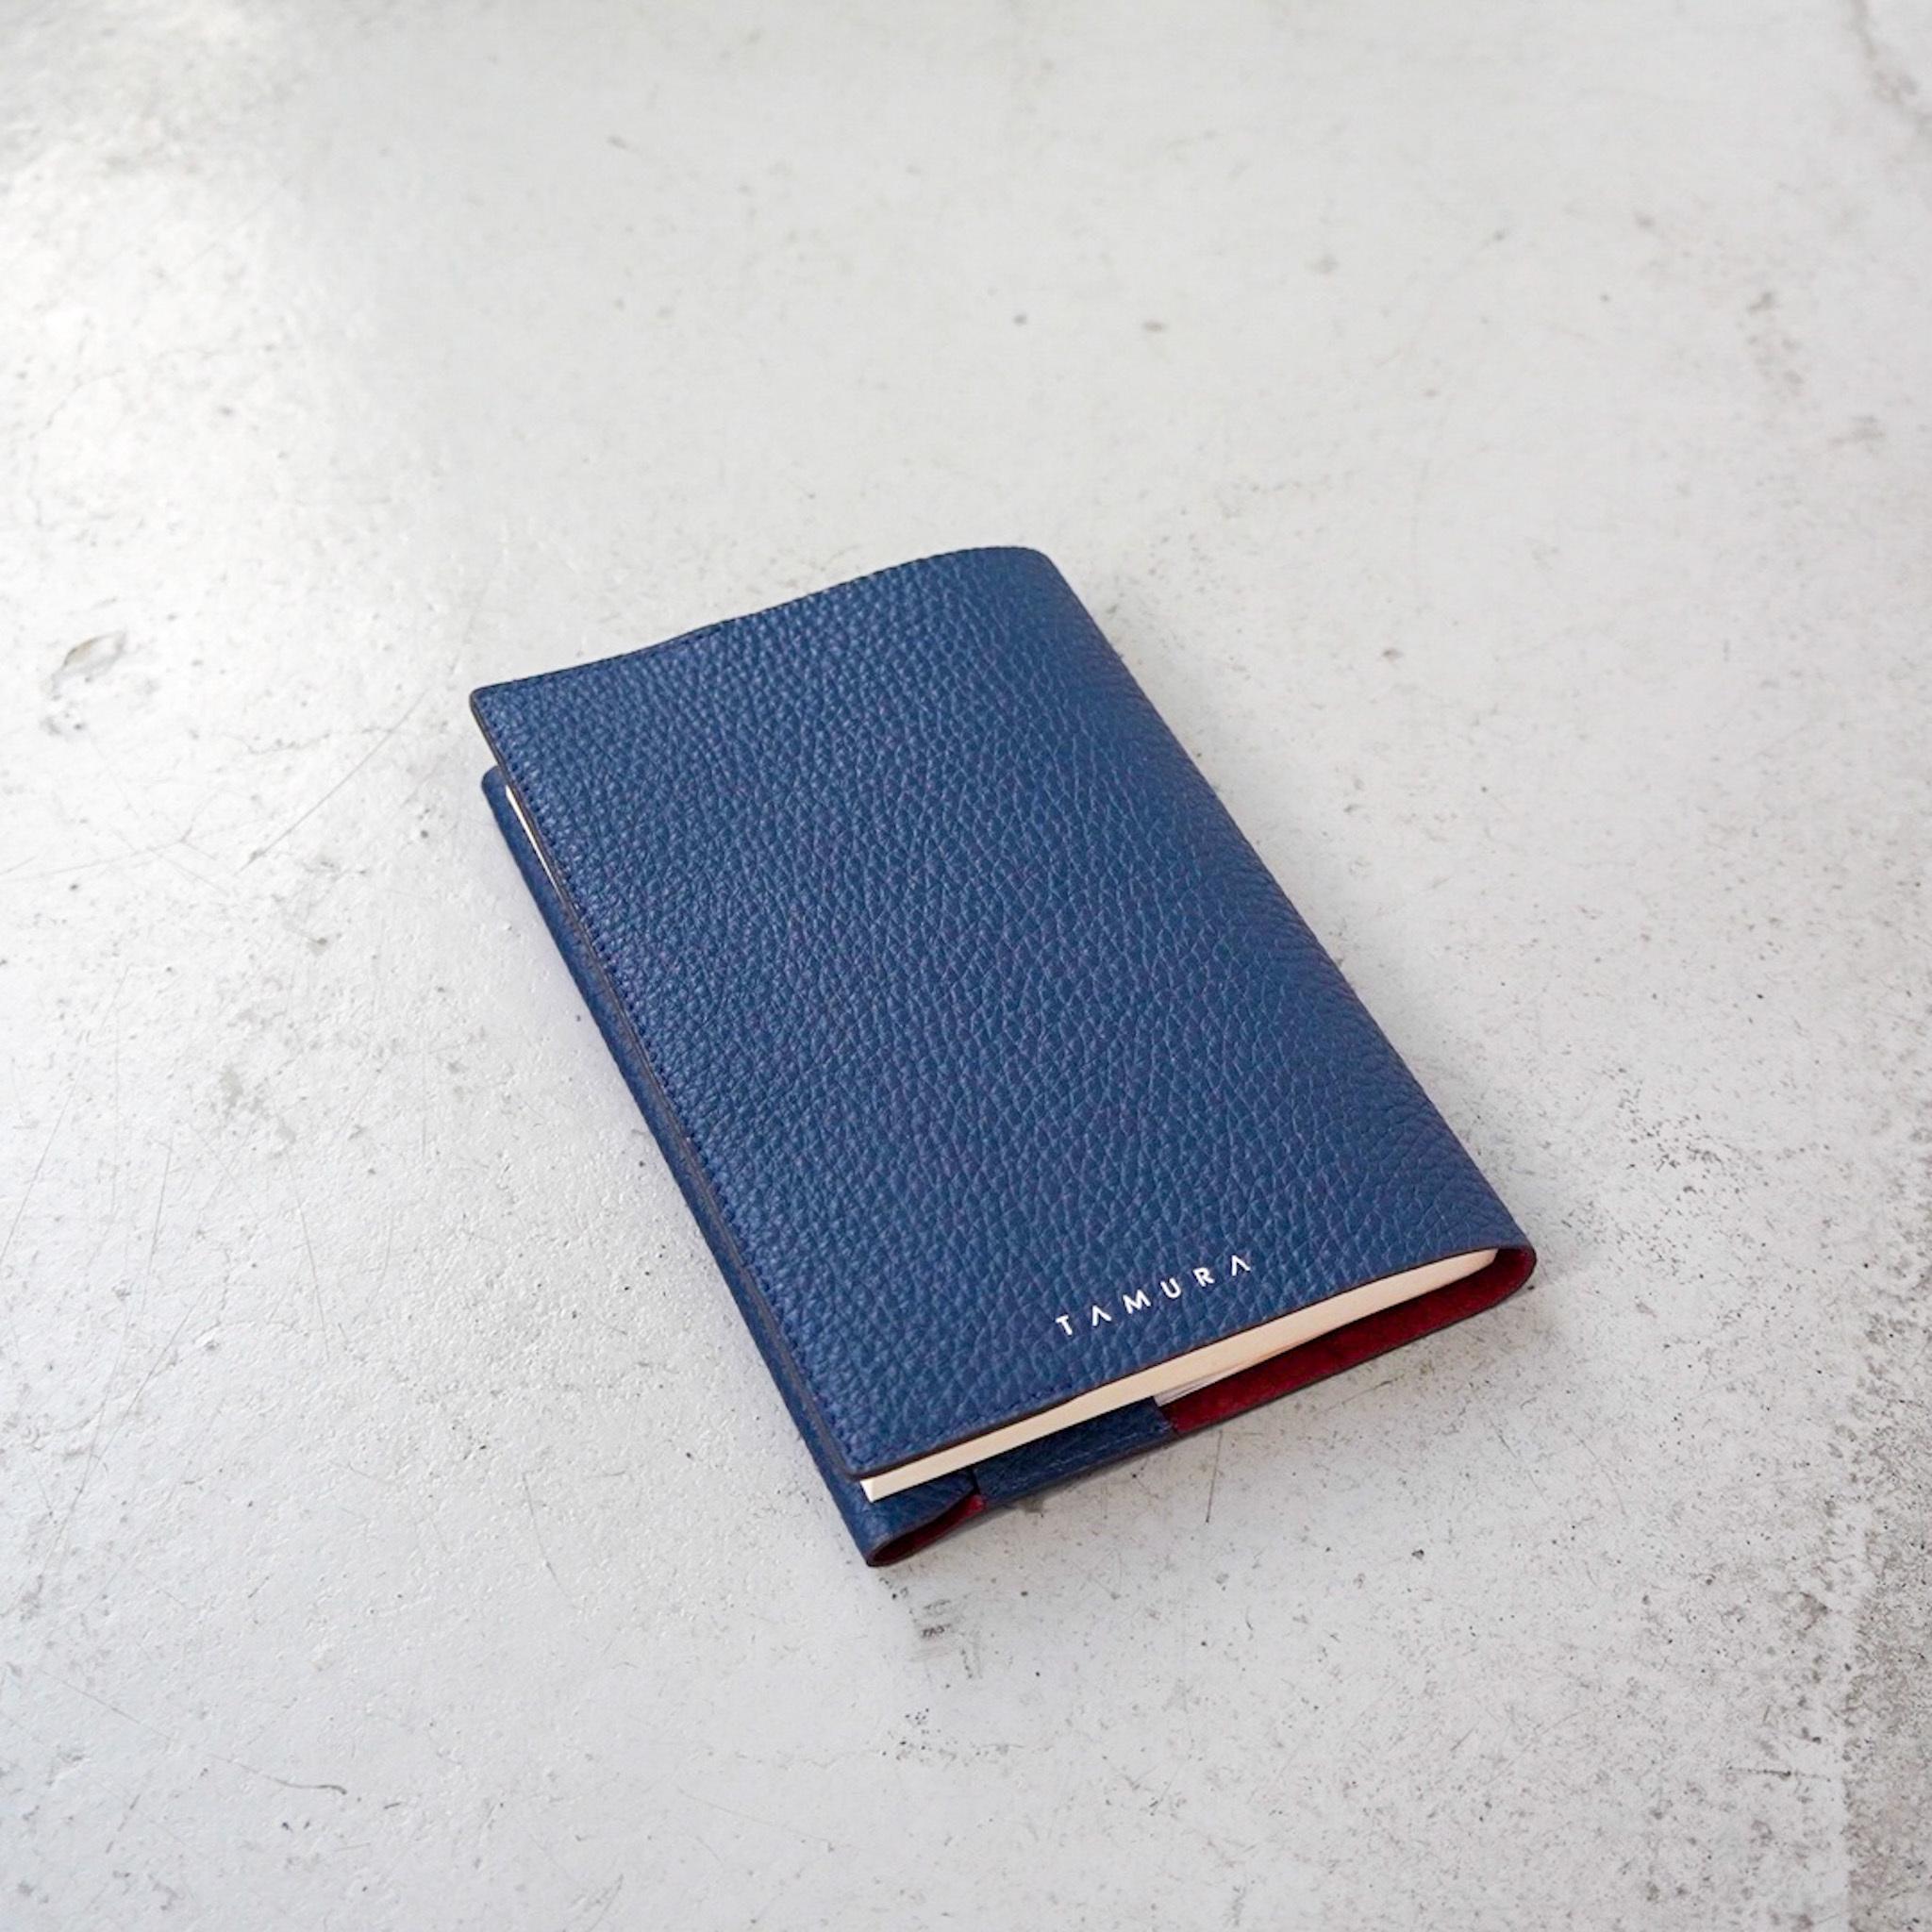 BOOK COVER(文庫サイズ)ブルー × レンガ